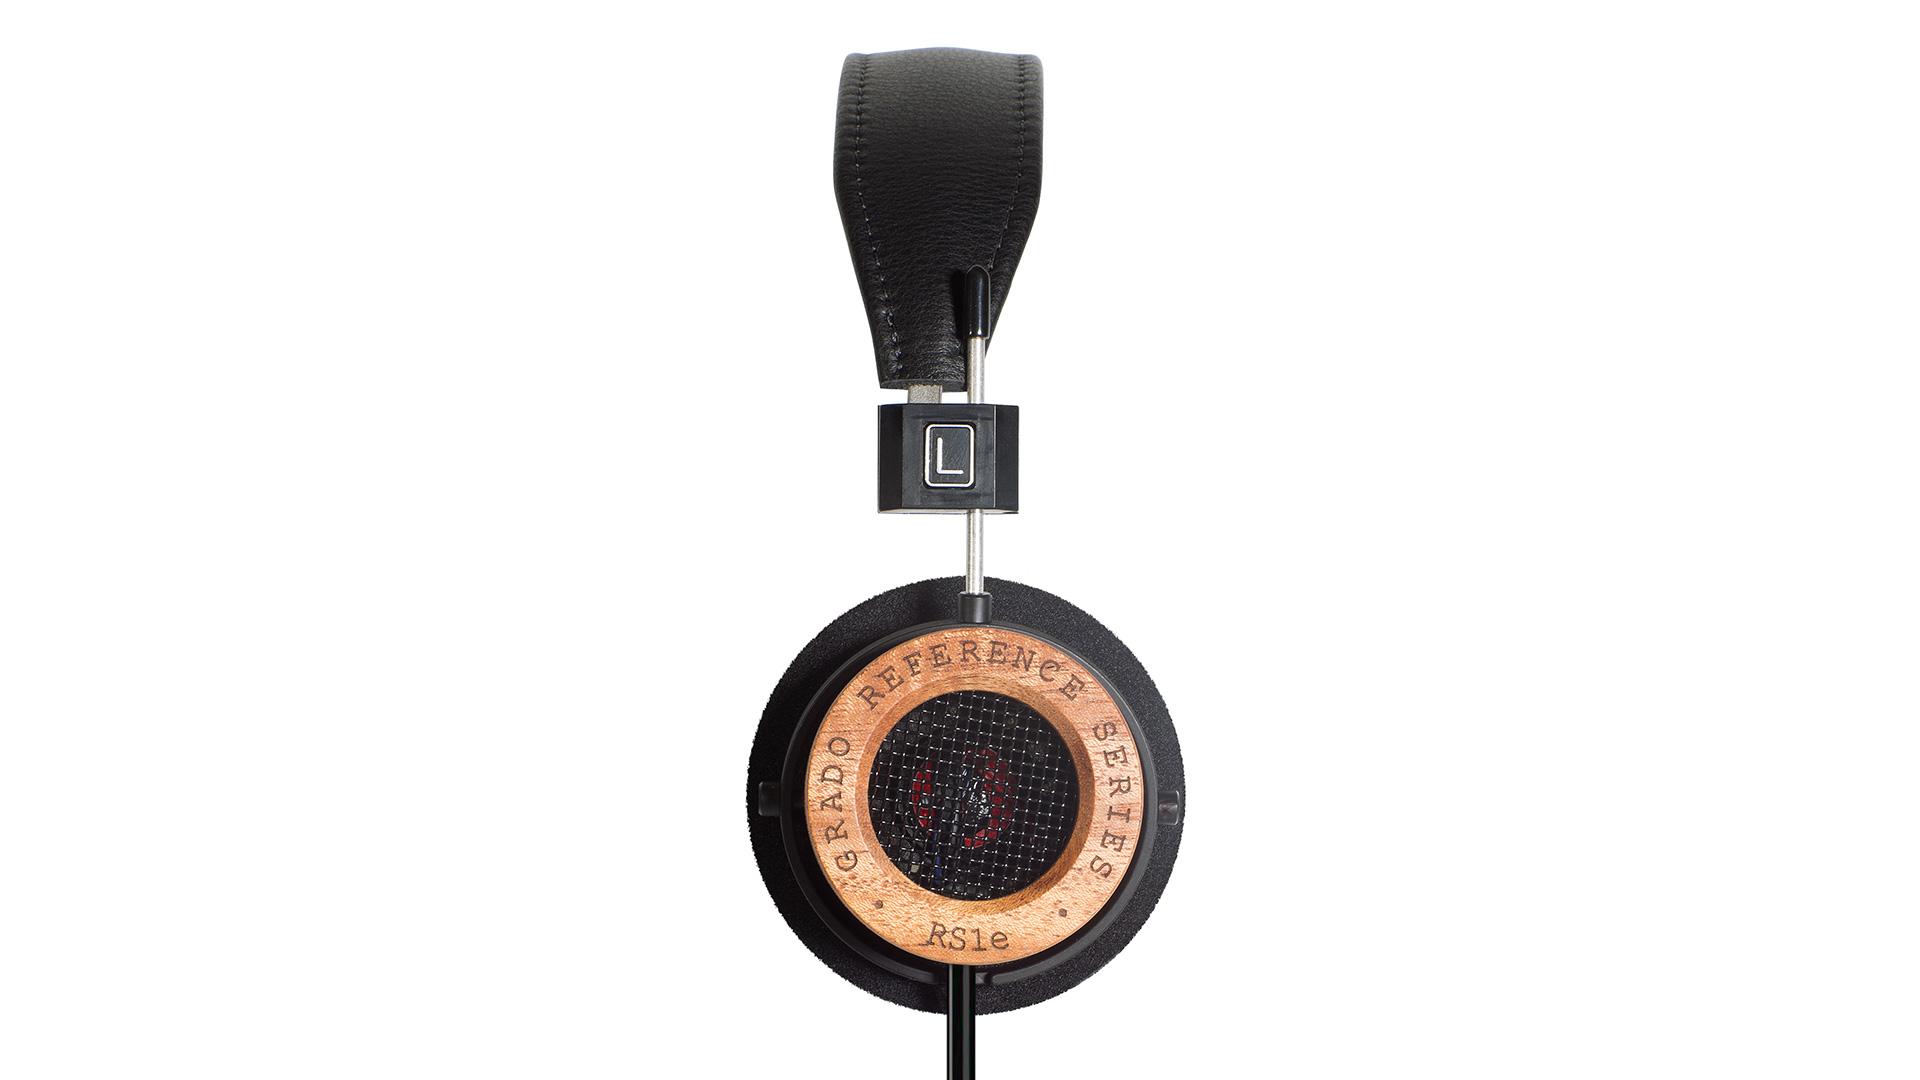 Grado RS1e Headphones at Creative Audio in Winnipeg